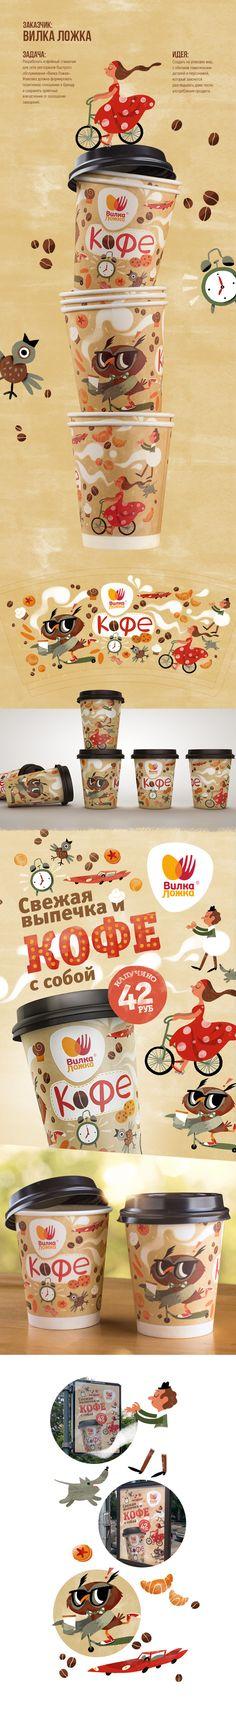 Coffee cup | Стаканчик для кофе by Pasha Marin, Olga Demidova, Feel Factory https://www.behance.net/gallery/18845419/Coffee-cup-stakanchik-dlja-kofe #coffee #kawa #cafe